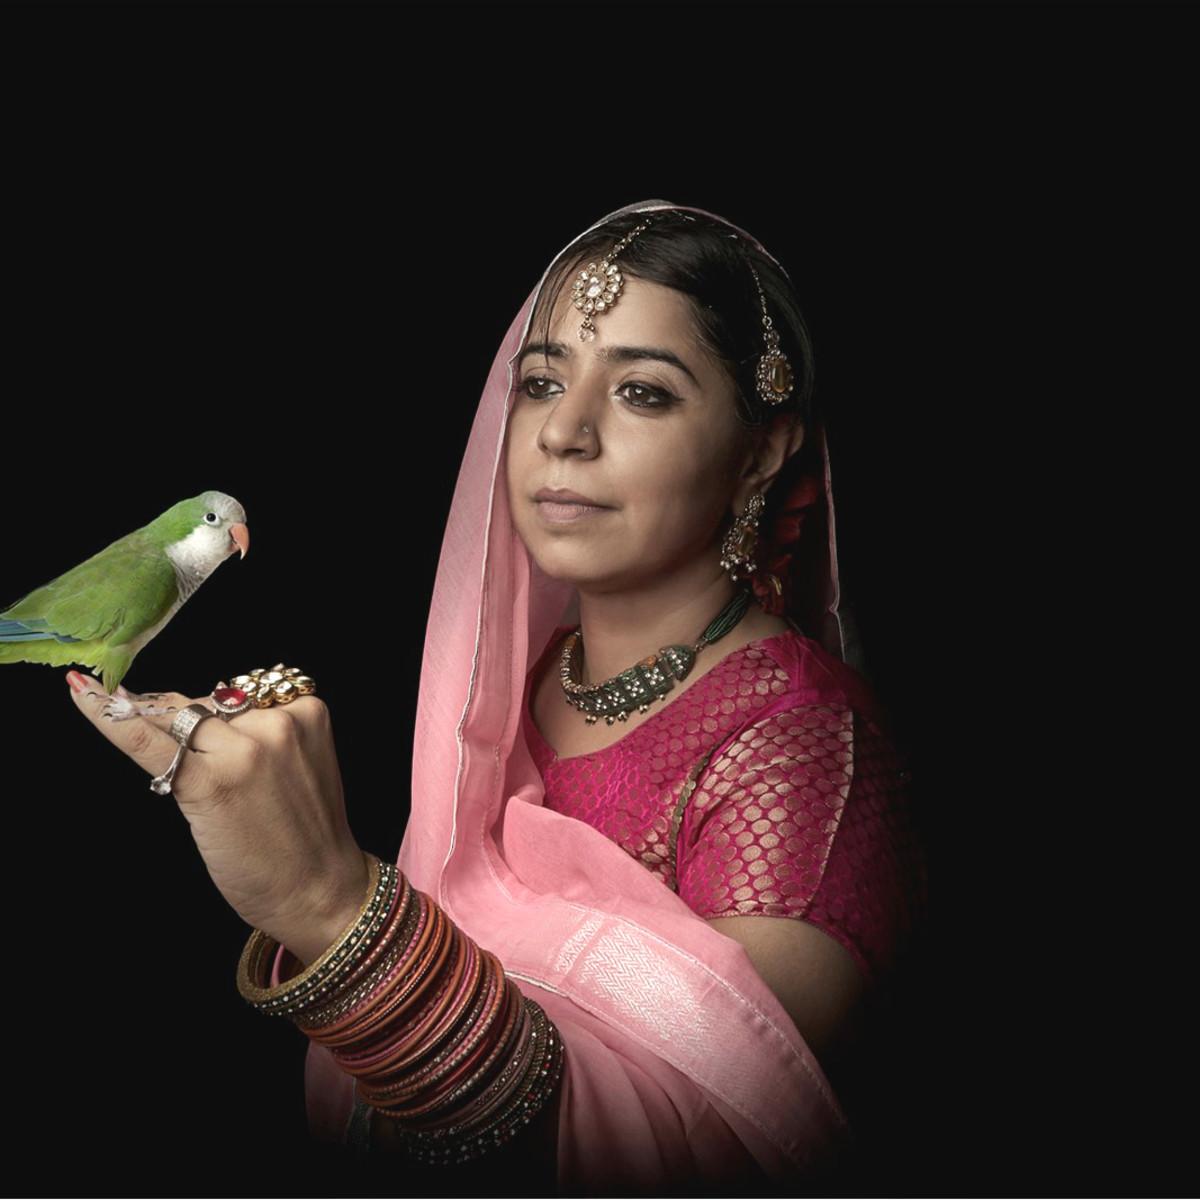 Fotofest women in sari with parrot